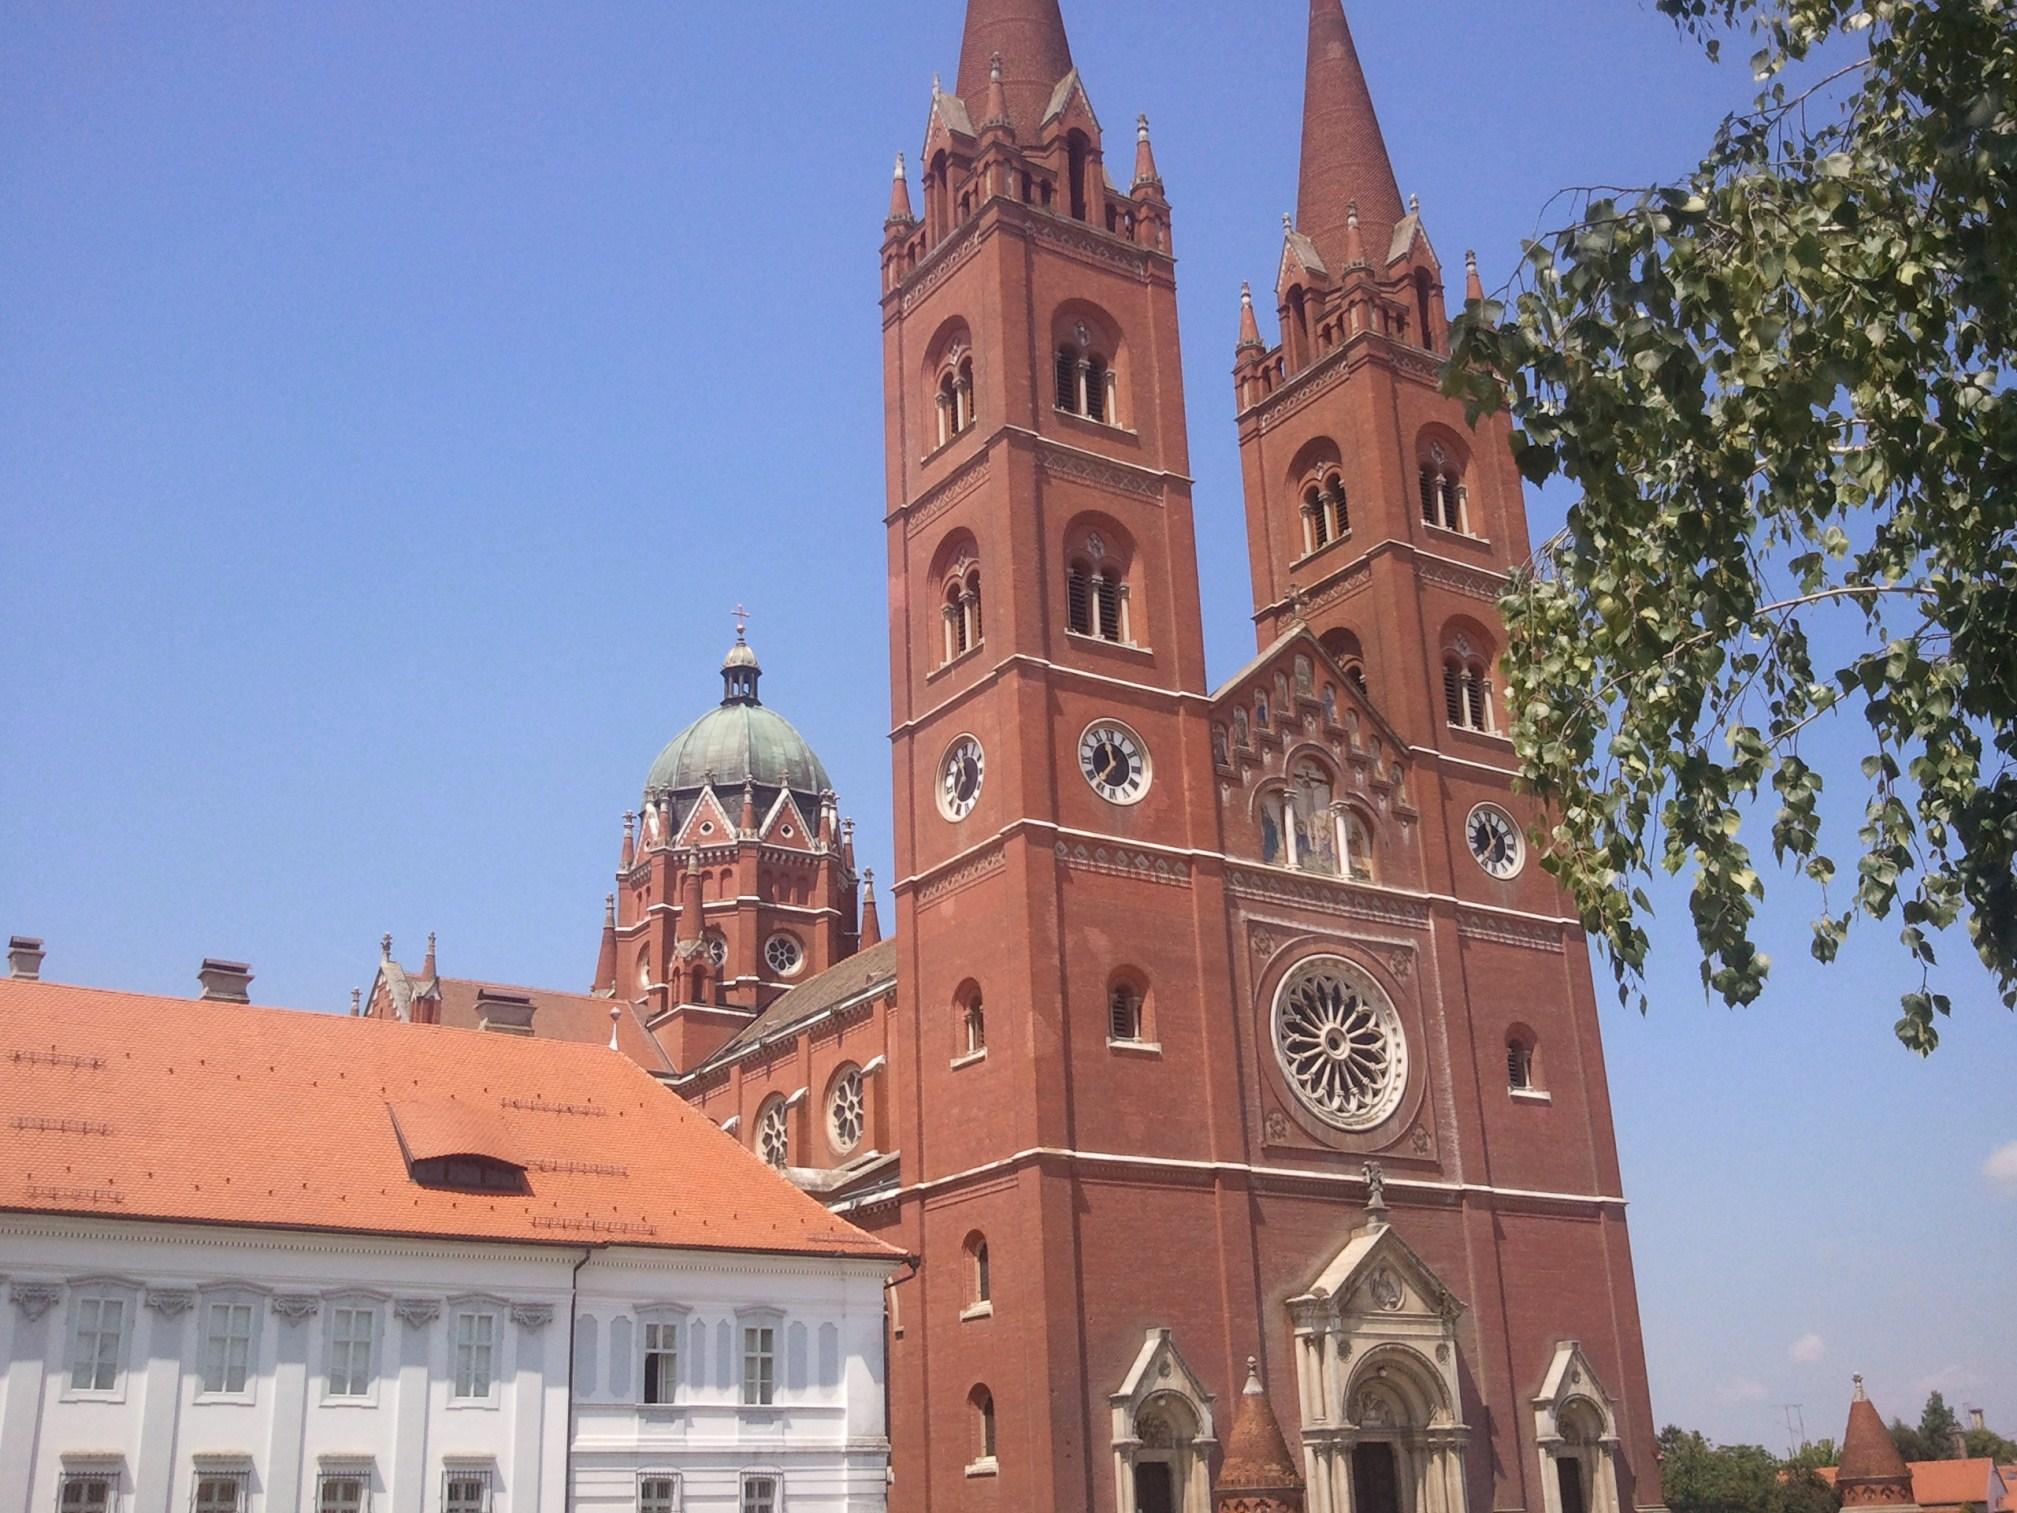 Biskupsko Đakovo i grofovsko Našice: Đakovo: Katedrala sv. Petra